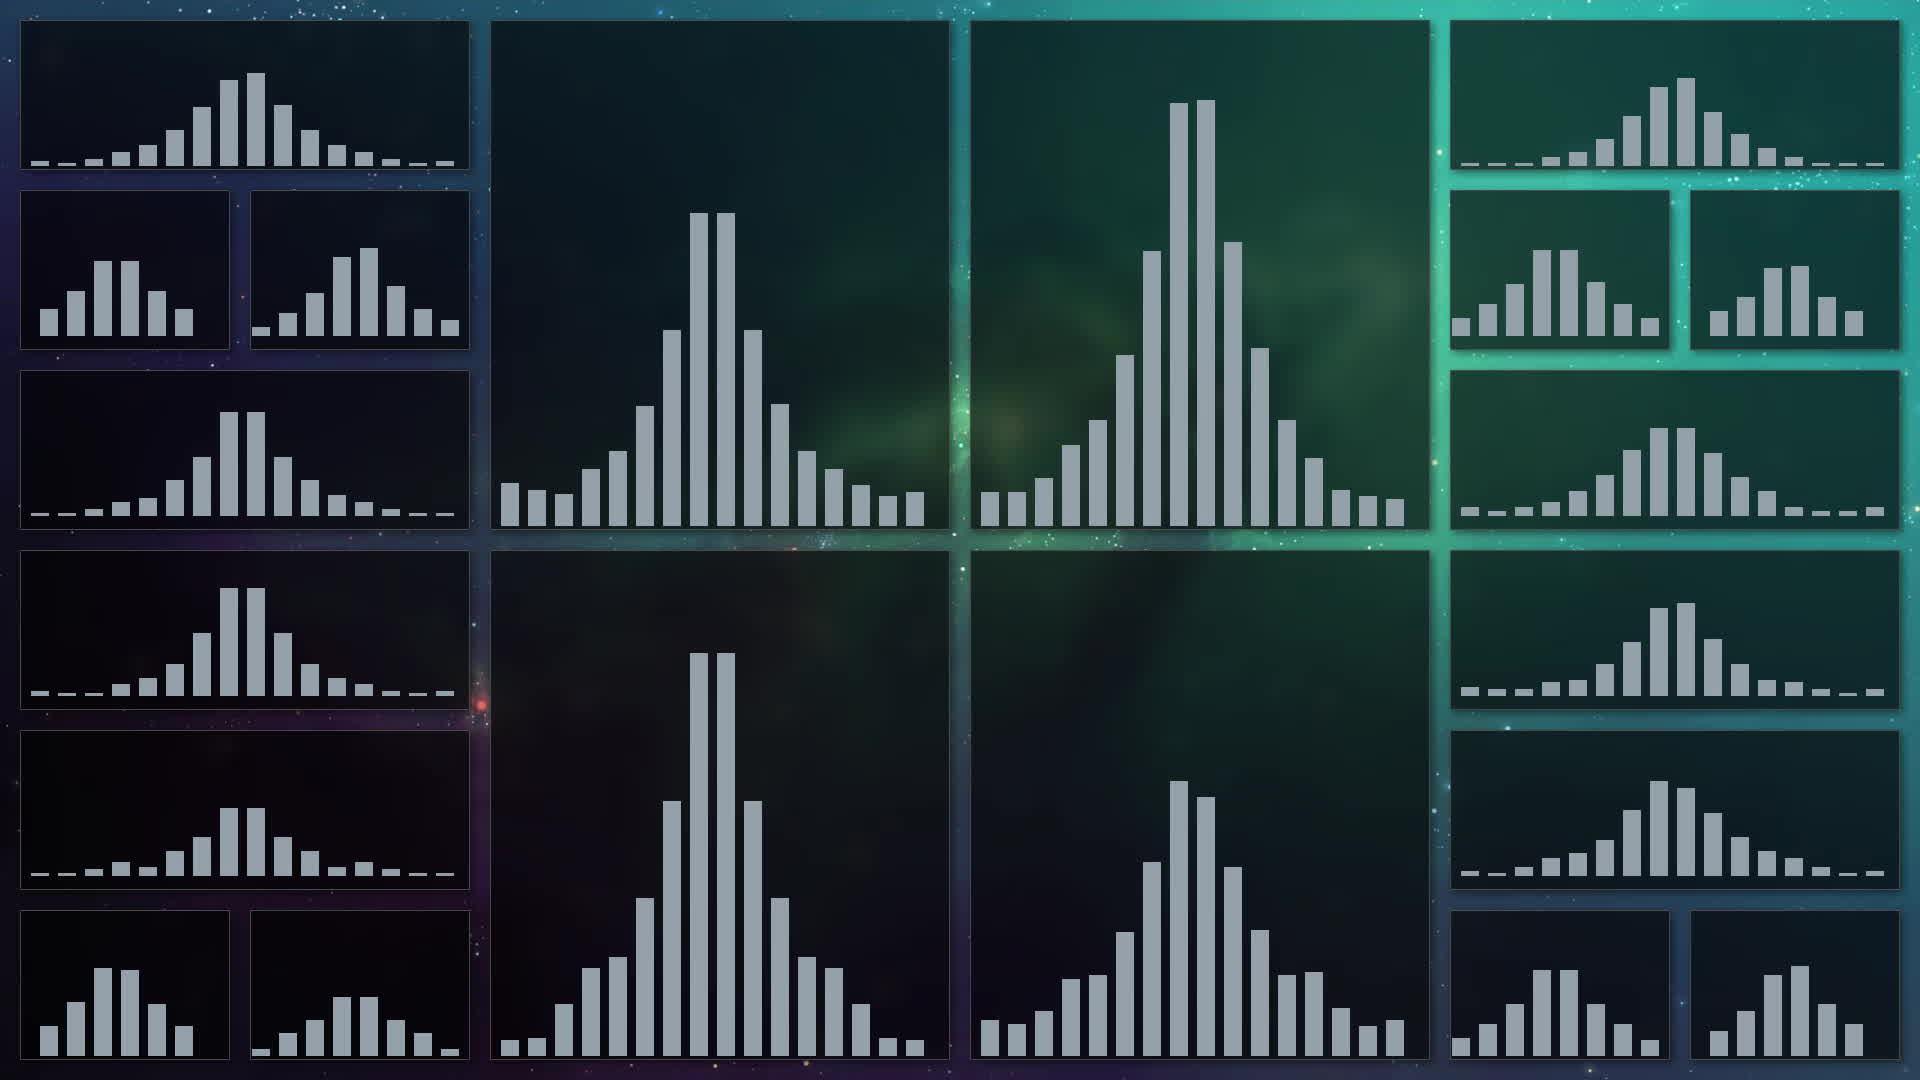 unixporn, i3 productivity GIFs